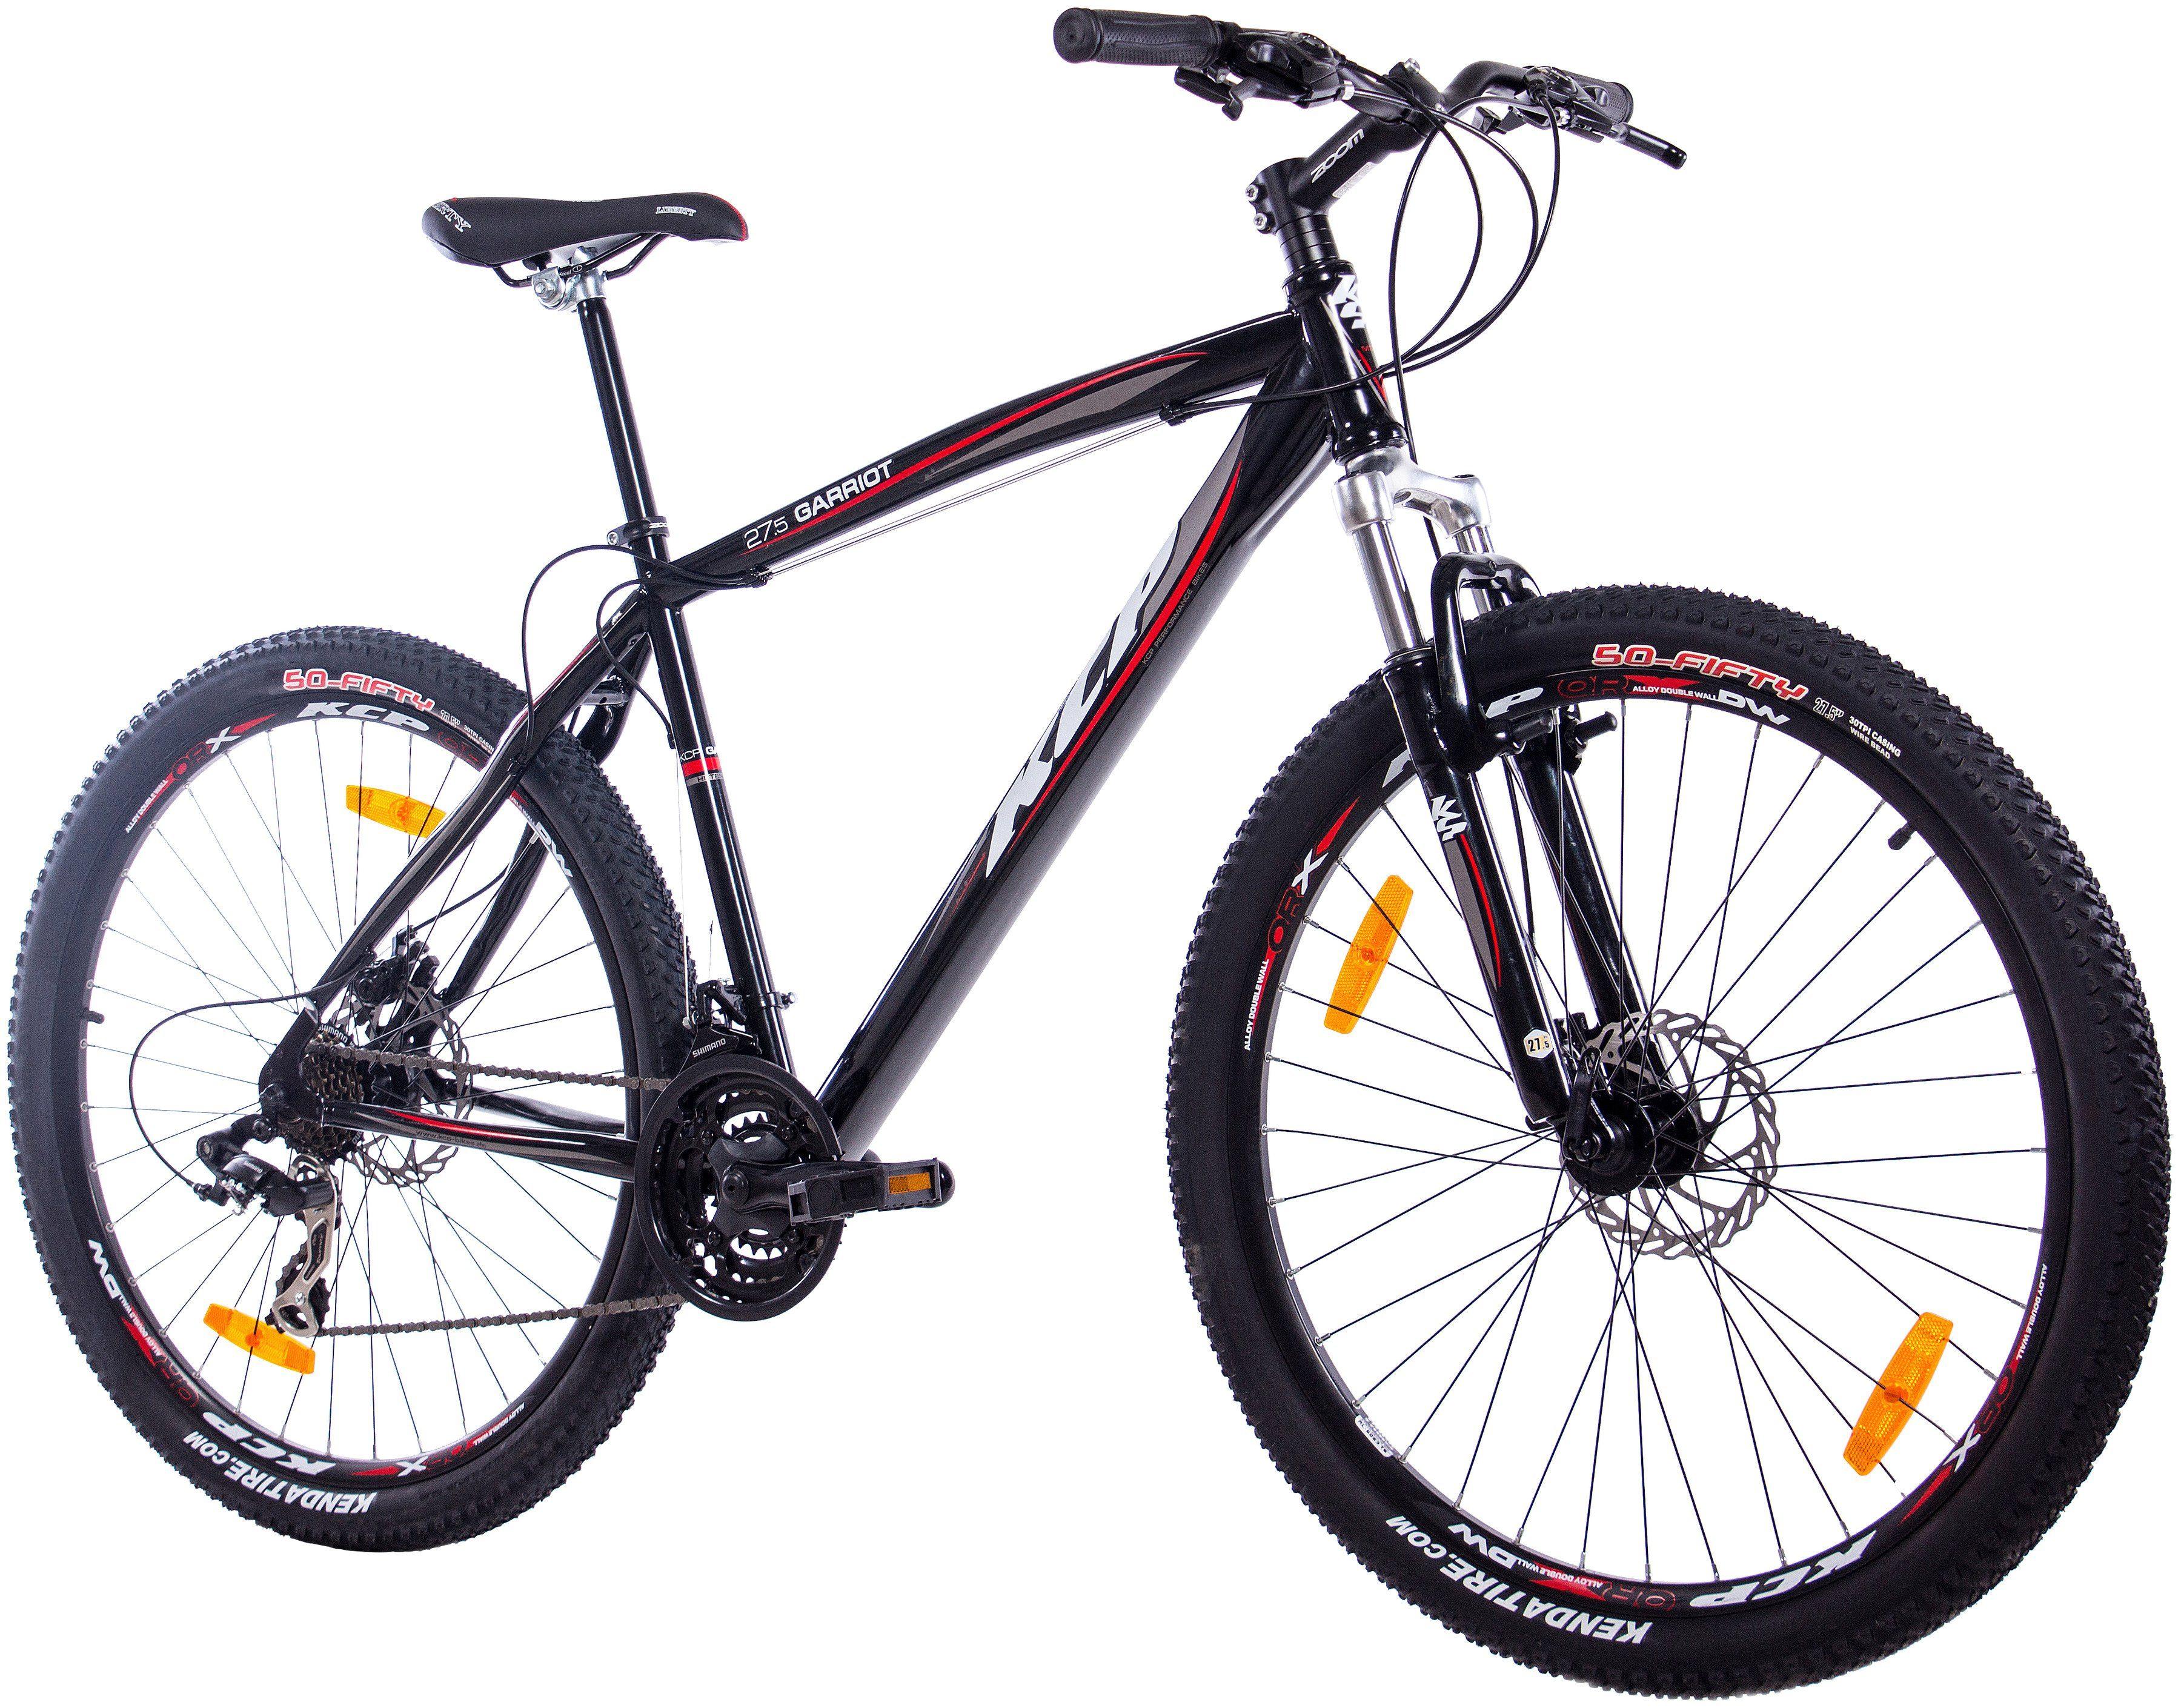 Mountainbike »GARRIOT schwarz«, 27,5 Zoll, 21 Gang, Scheibenbremsen